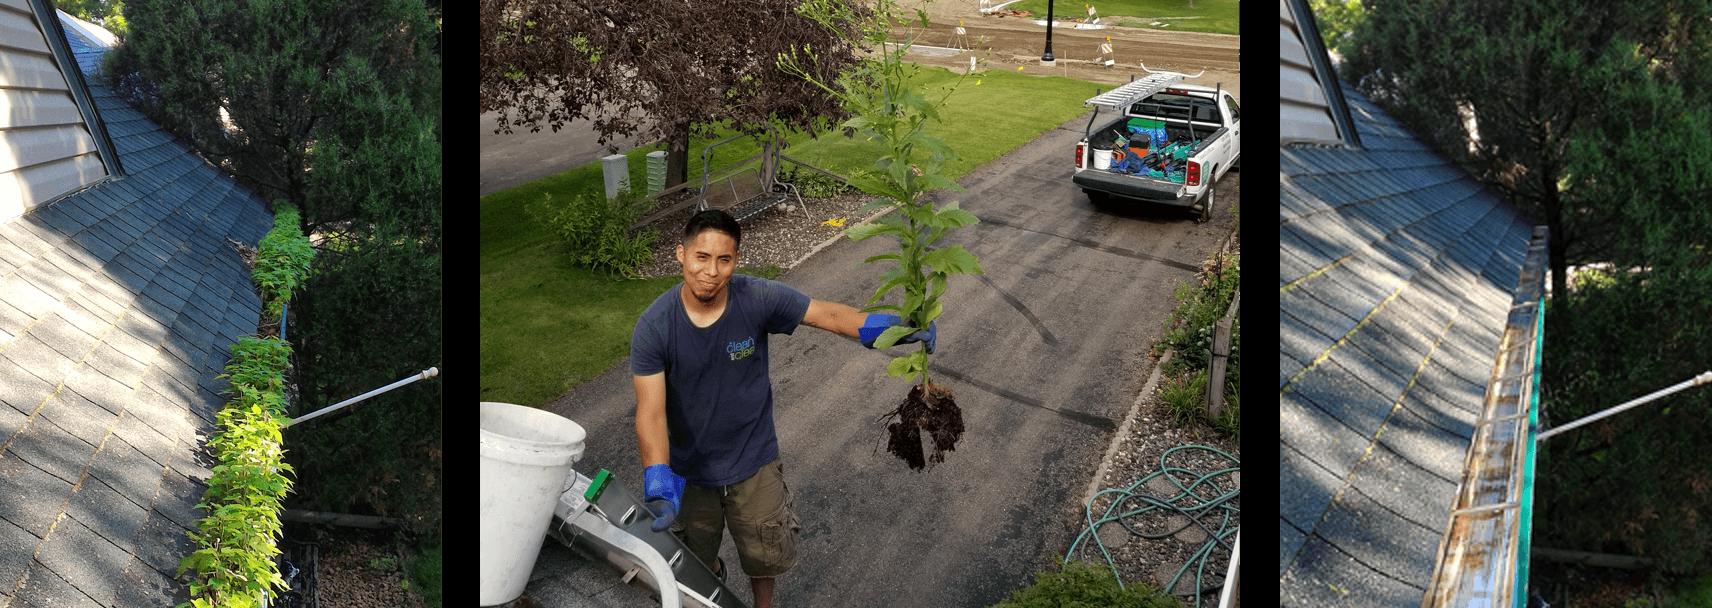 Gutter Cleaning Minneapolis, St. Paul MN